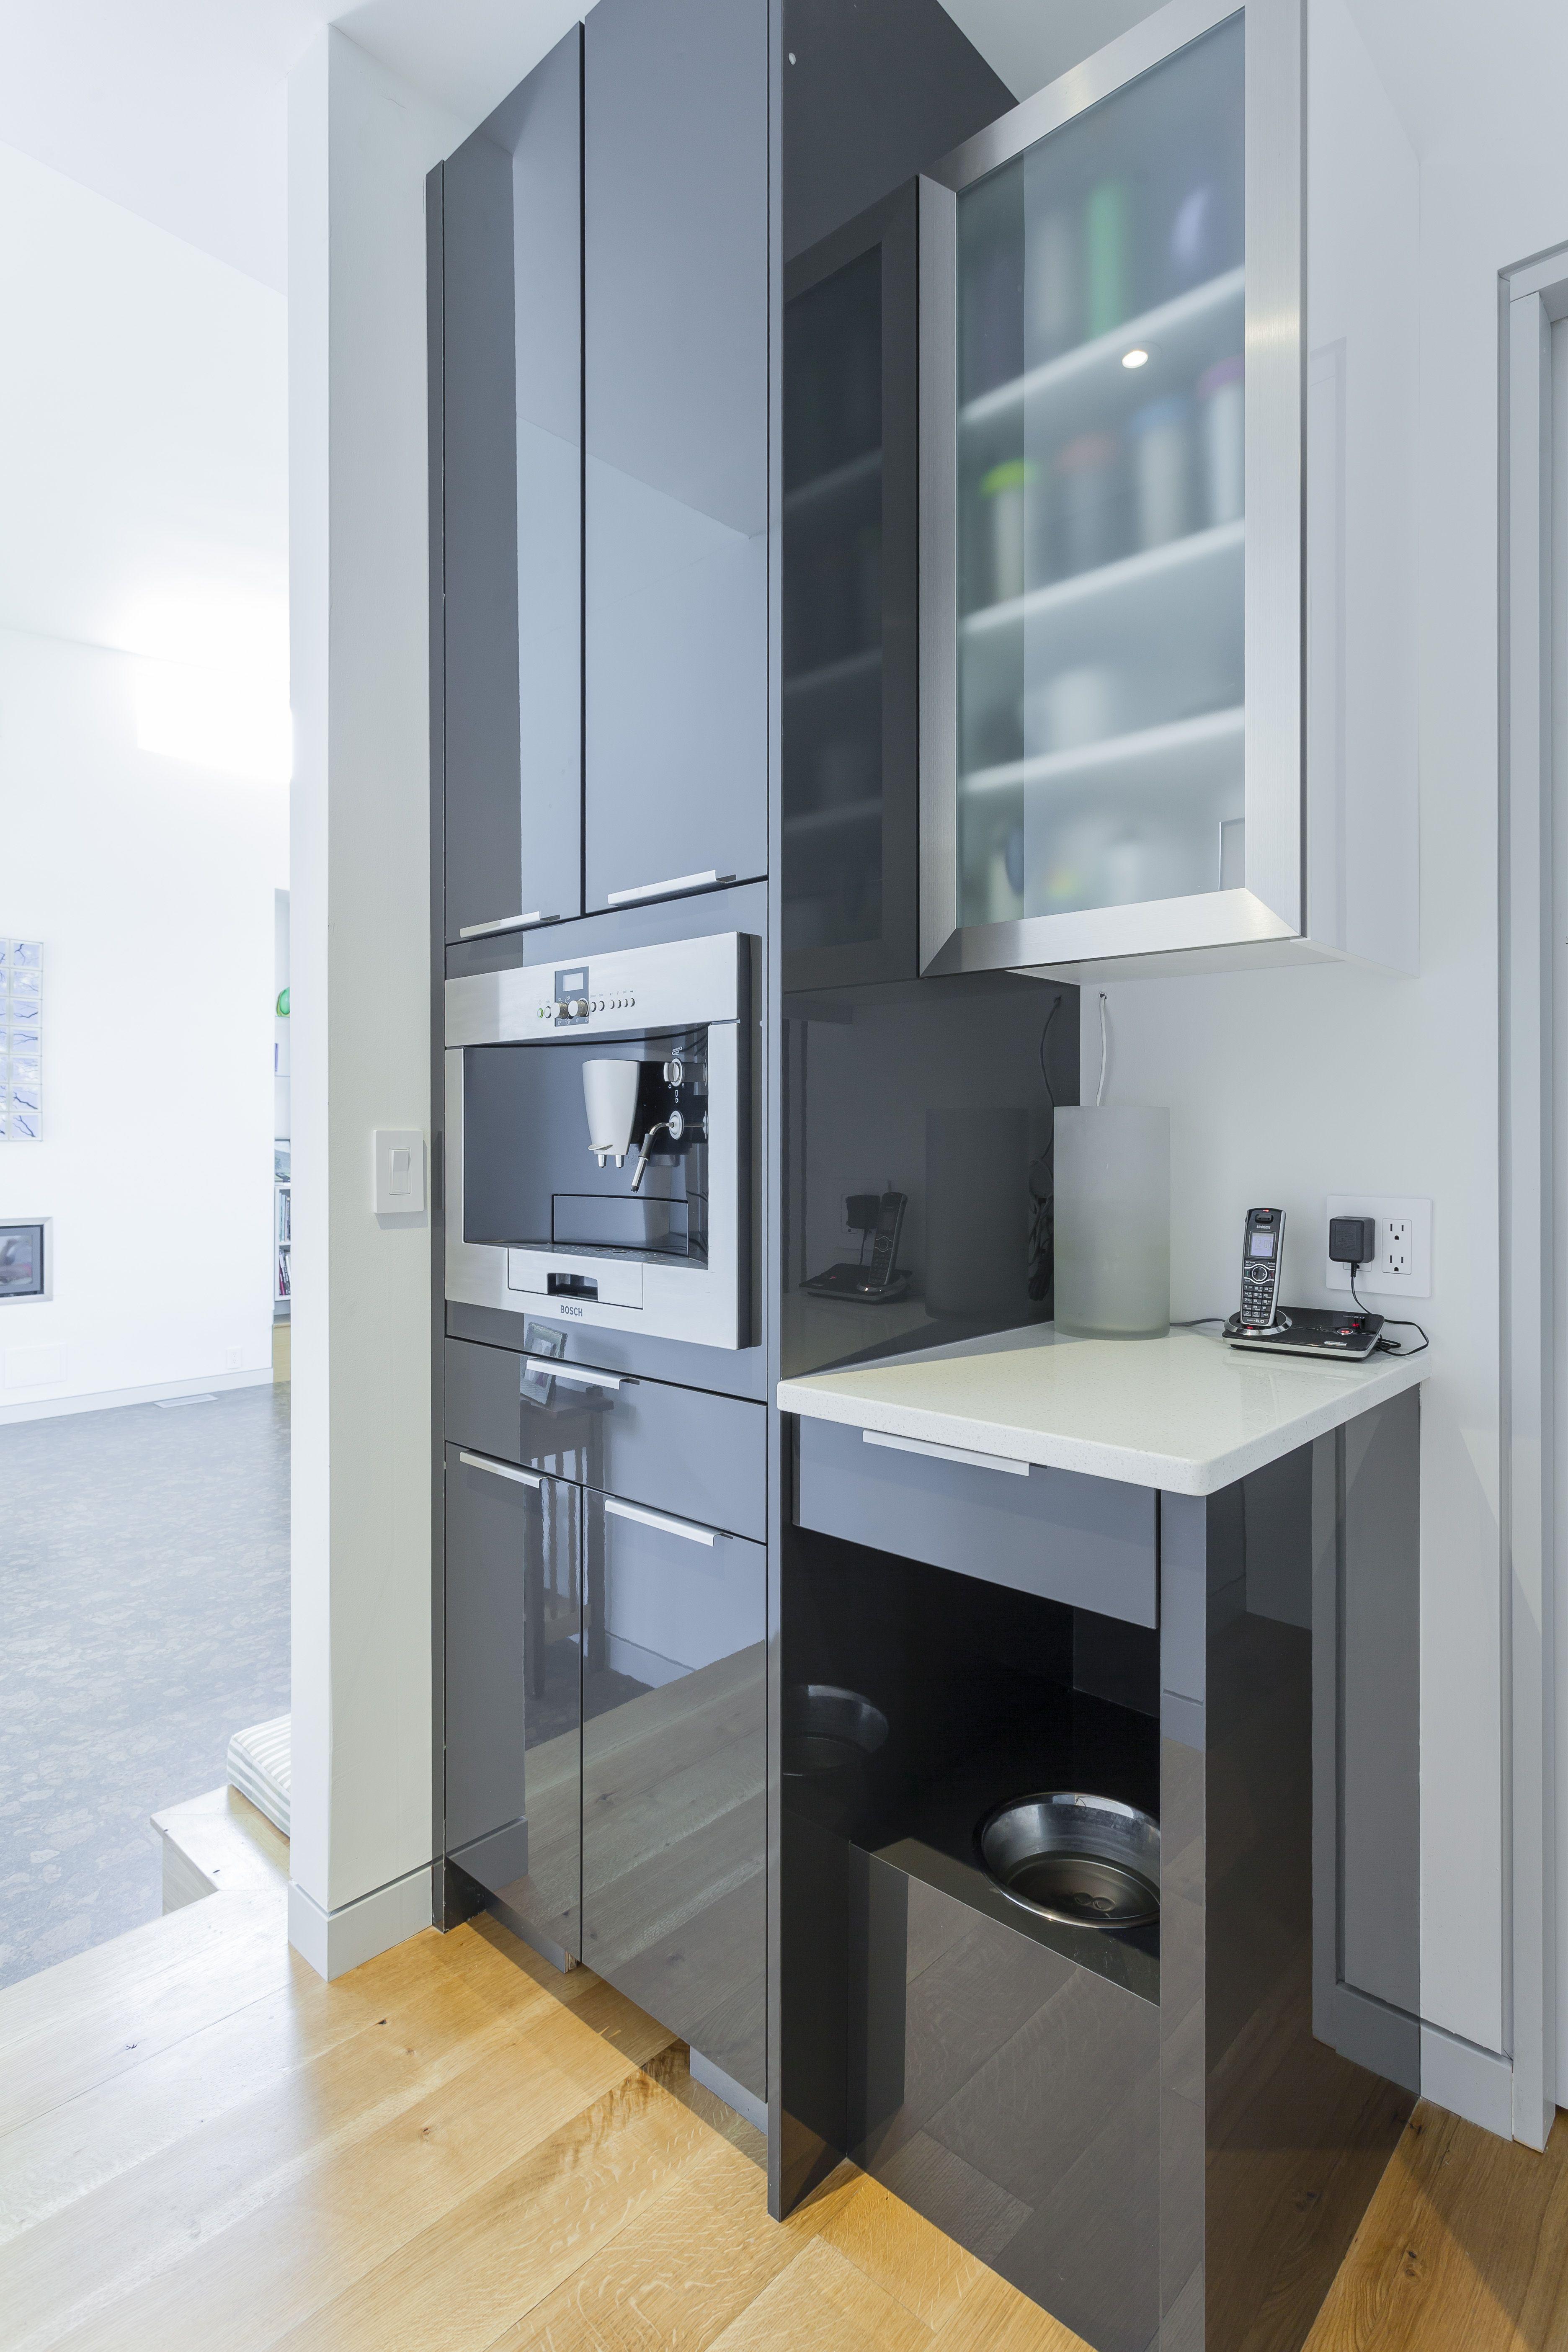 Elmwood Cabinetry Bosch Appliances Back Kitchen Large Walkin Pantry Dog Food Niche Contemporary Kitchen Modern Cabinets Kitchen Living